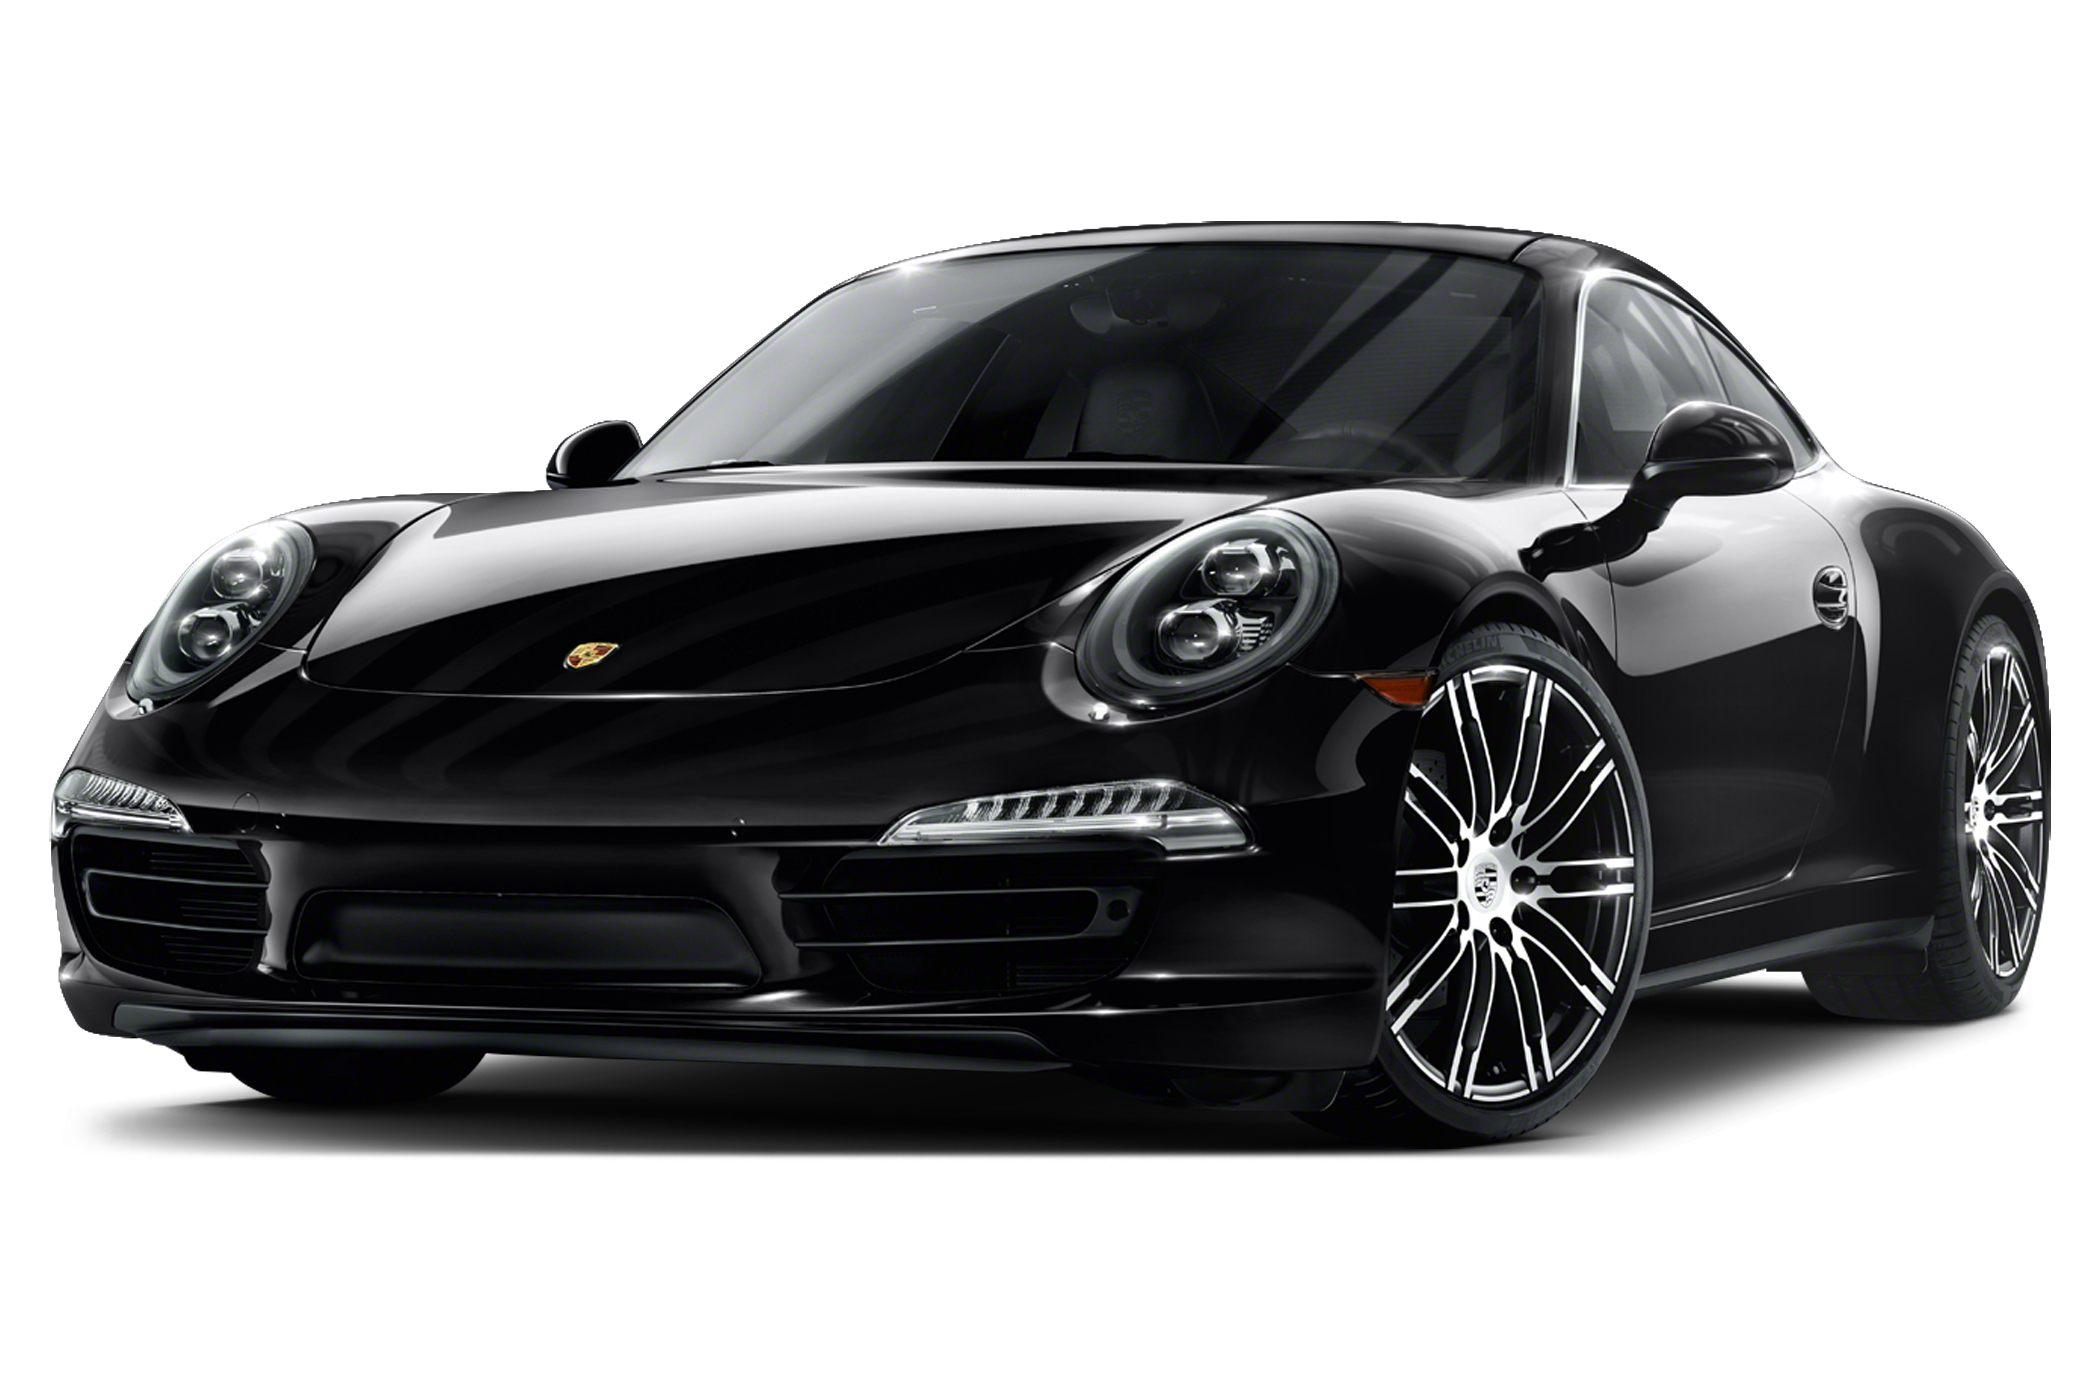 2016 Porsche 911 Carrera Black Edition 2dr Rear Wheel Drive Coupe Specs And Prices